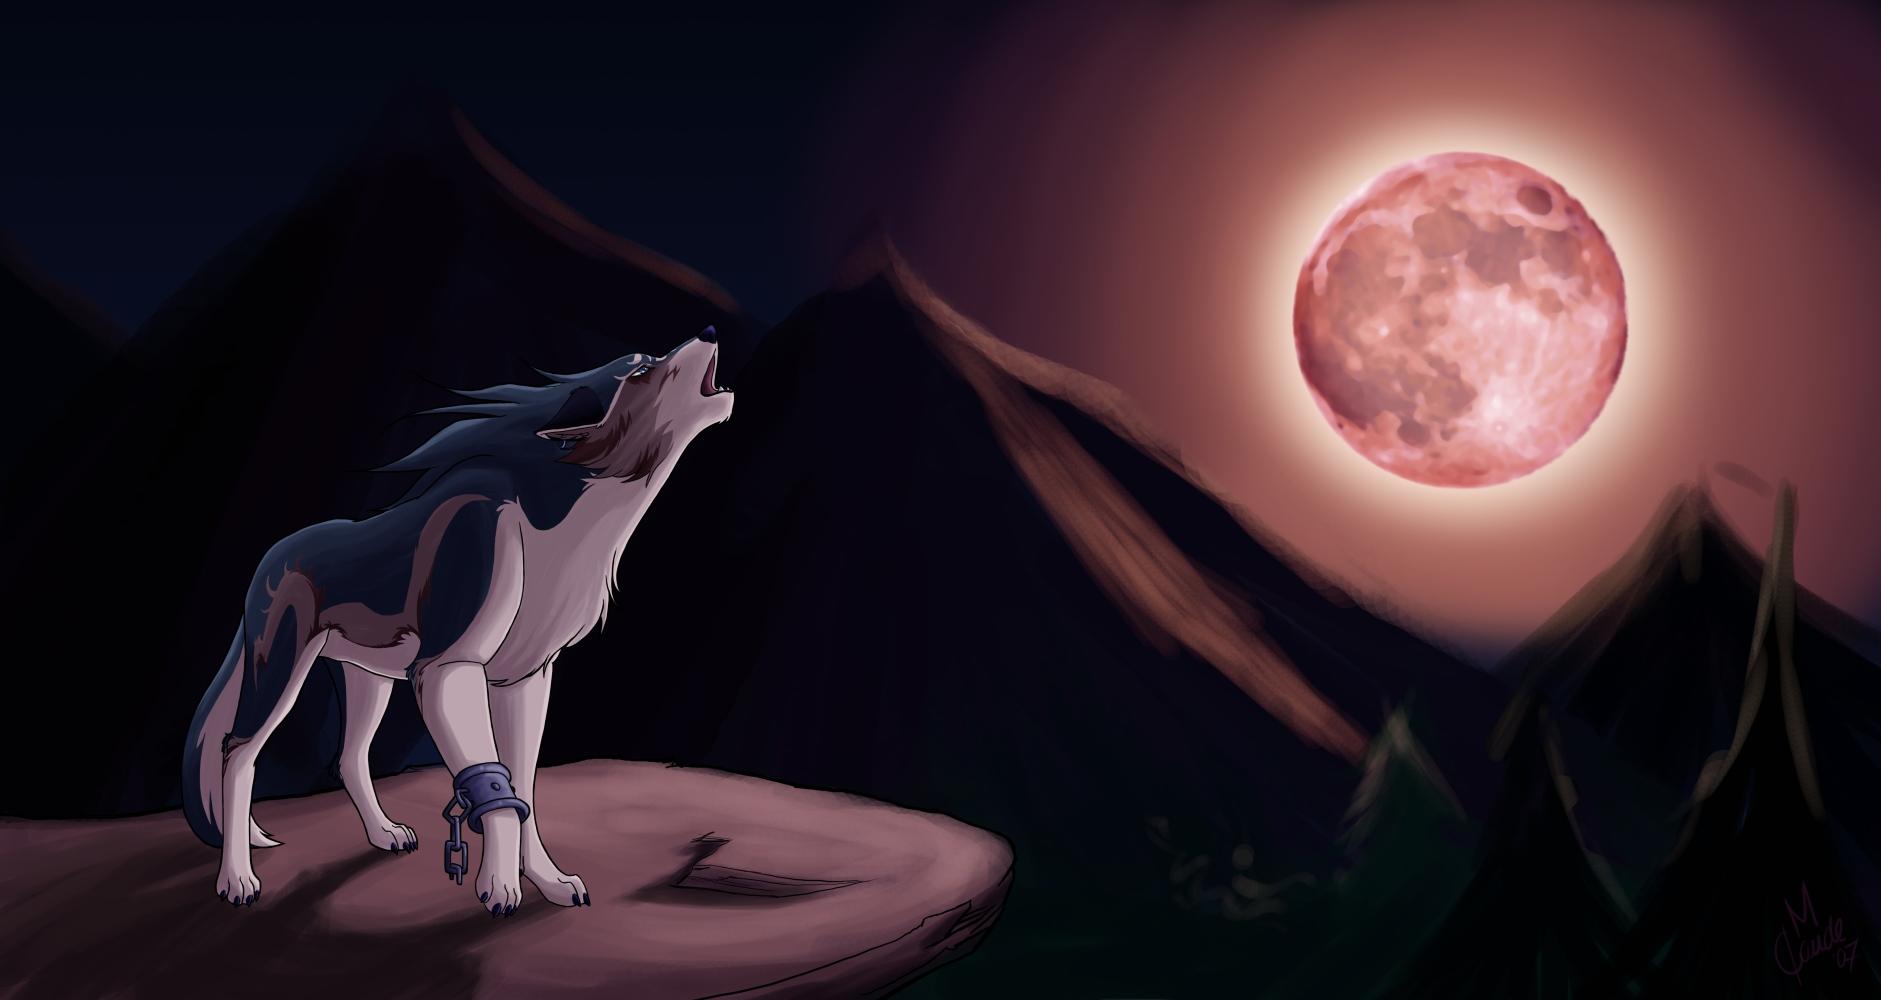 Breath Of The Wild Dark Link >> Link, Wallpaper - Zerochan Anime Image Board